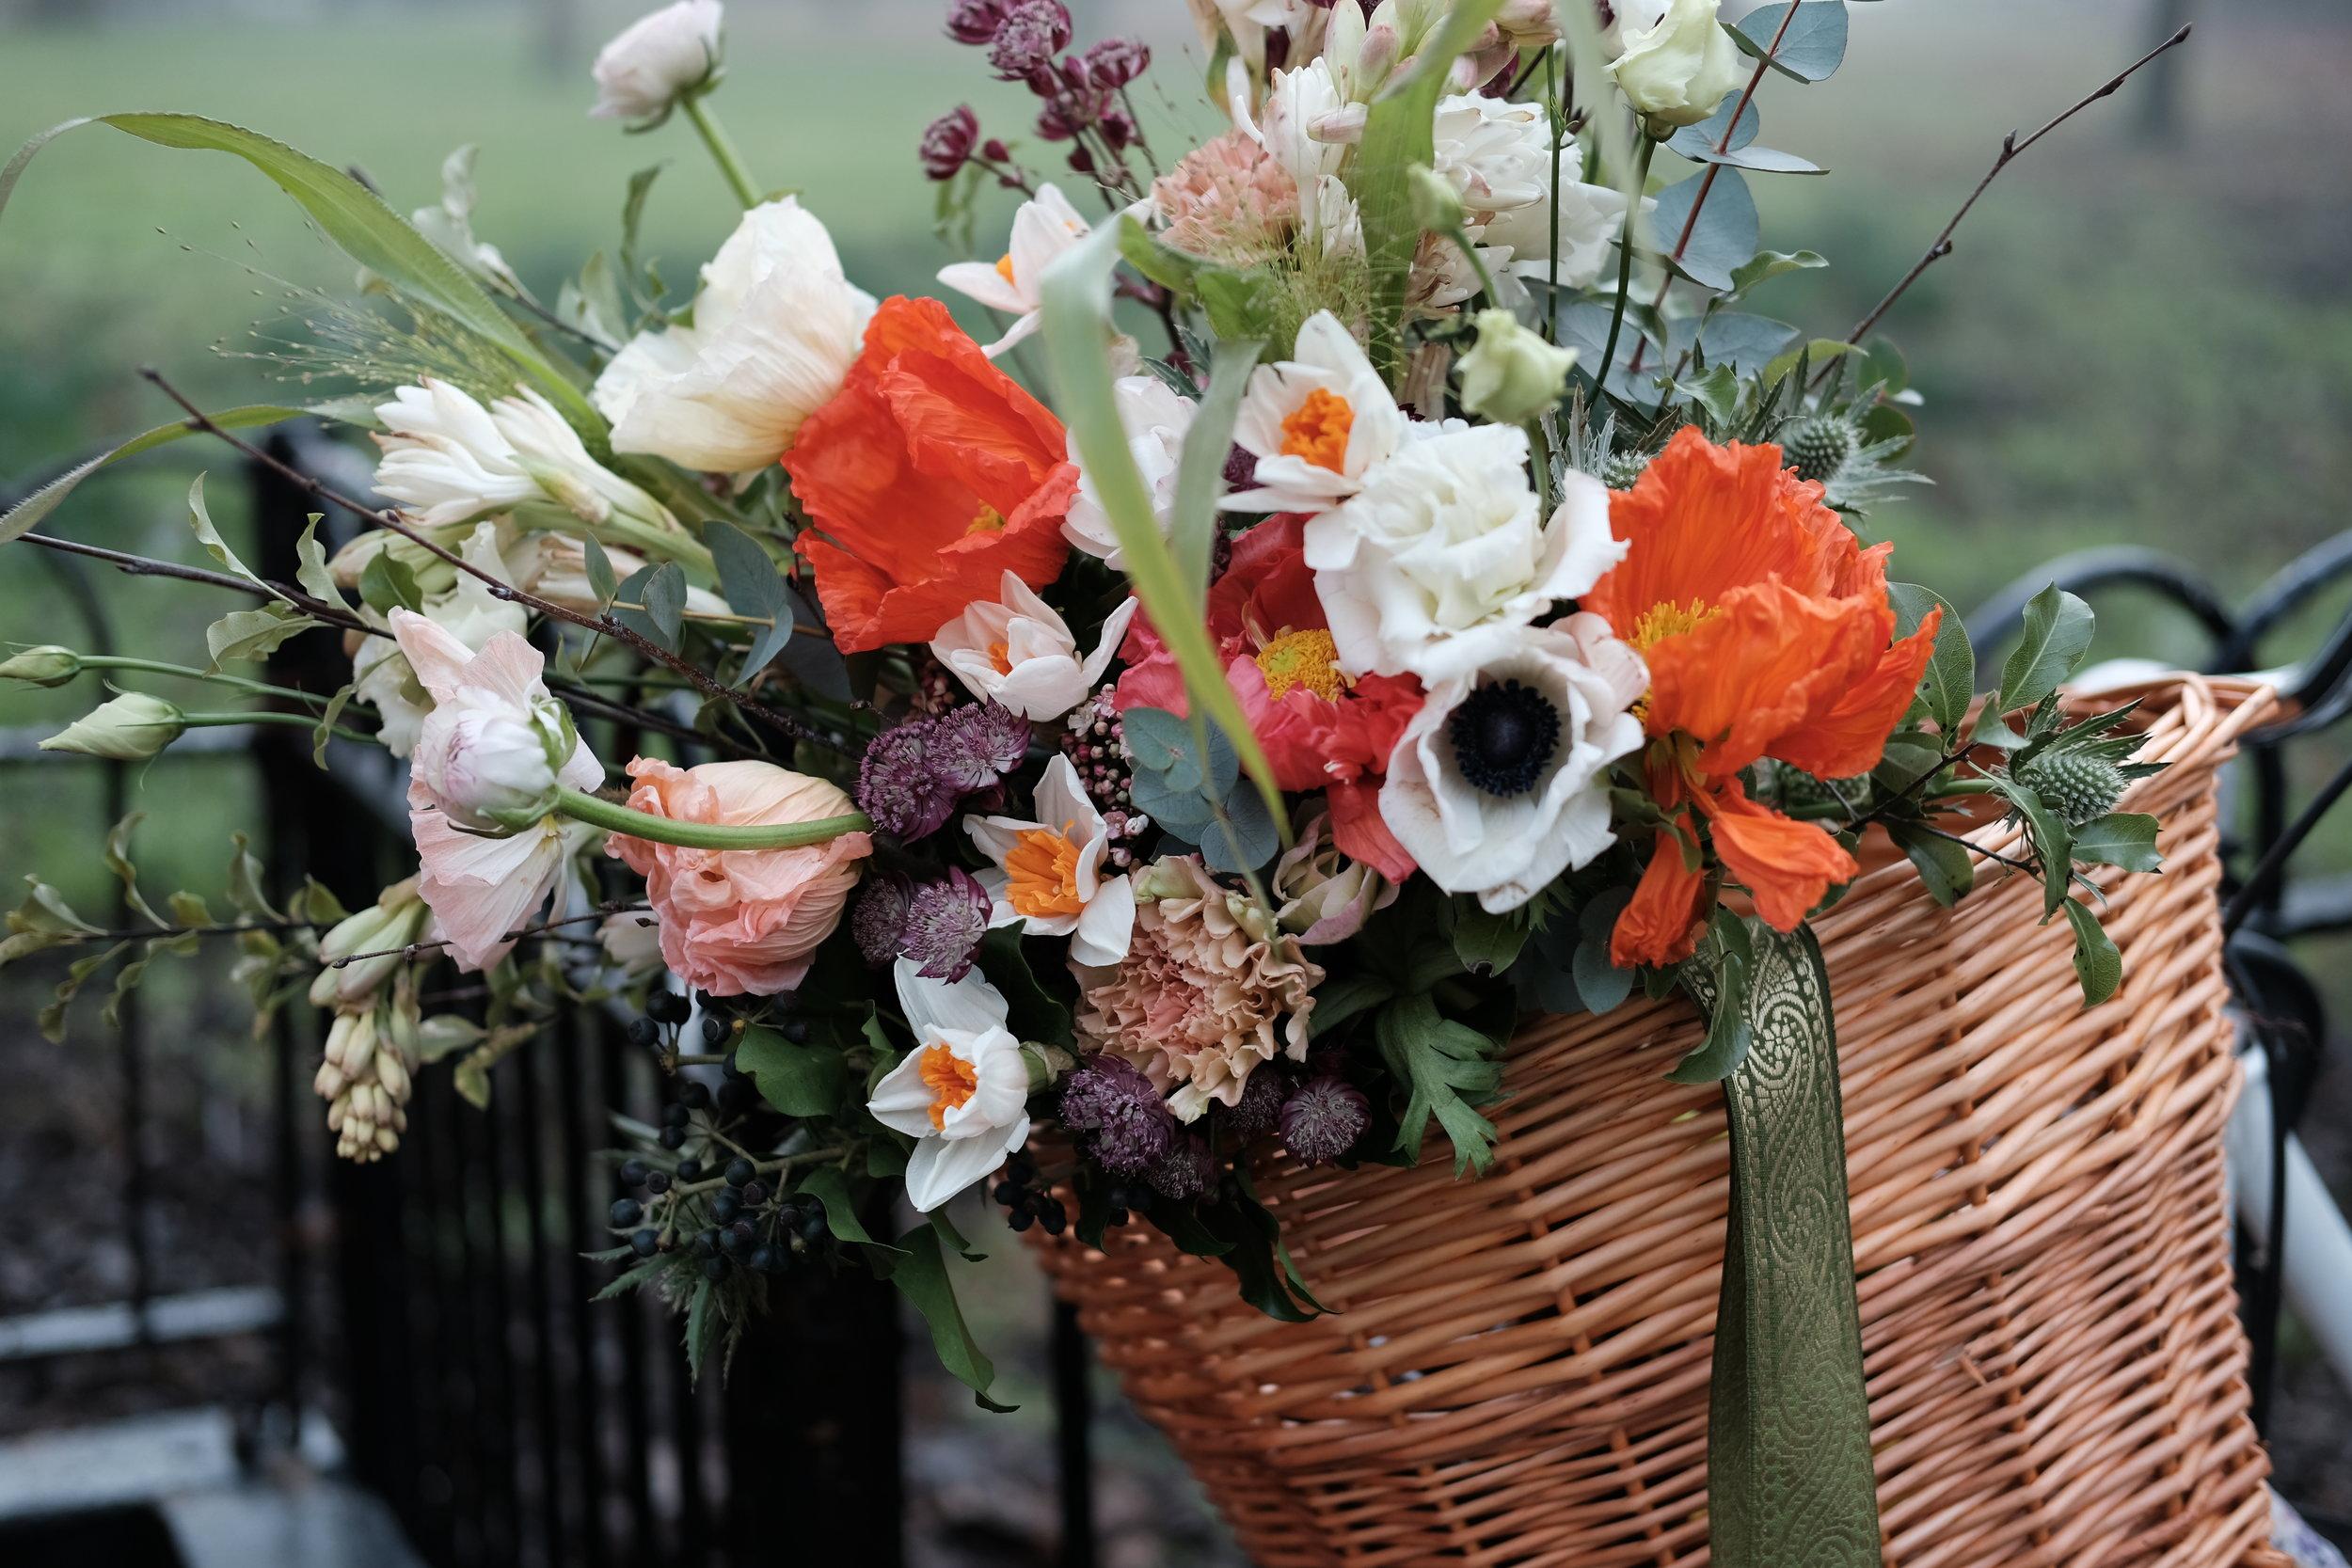 Brighton Bouquets By Bike - February 2019